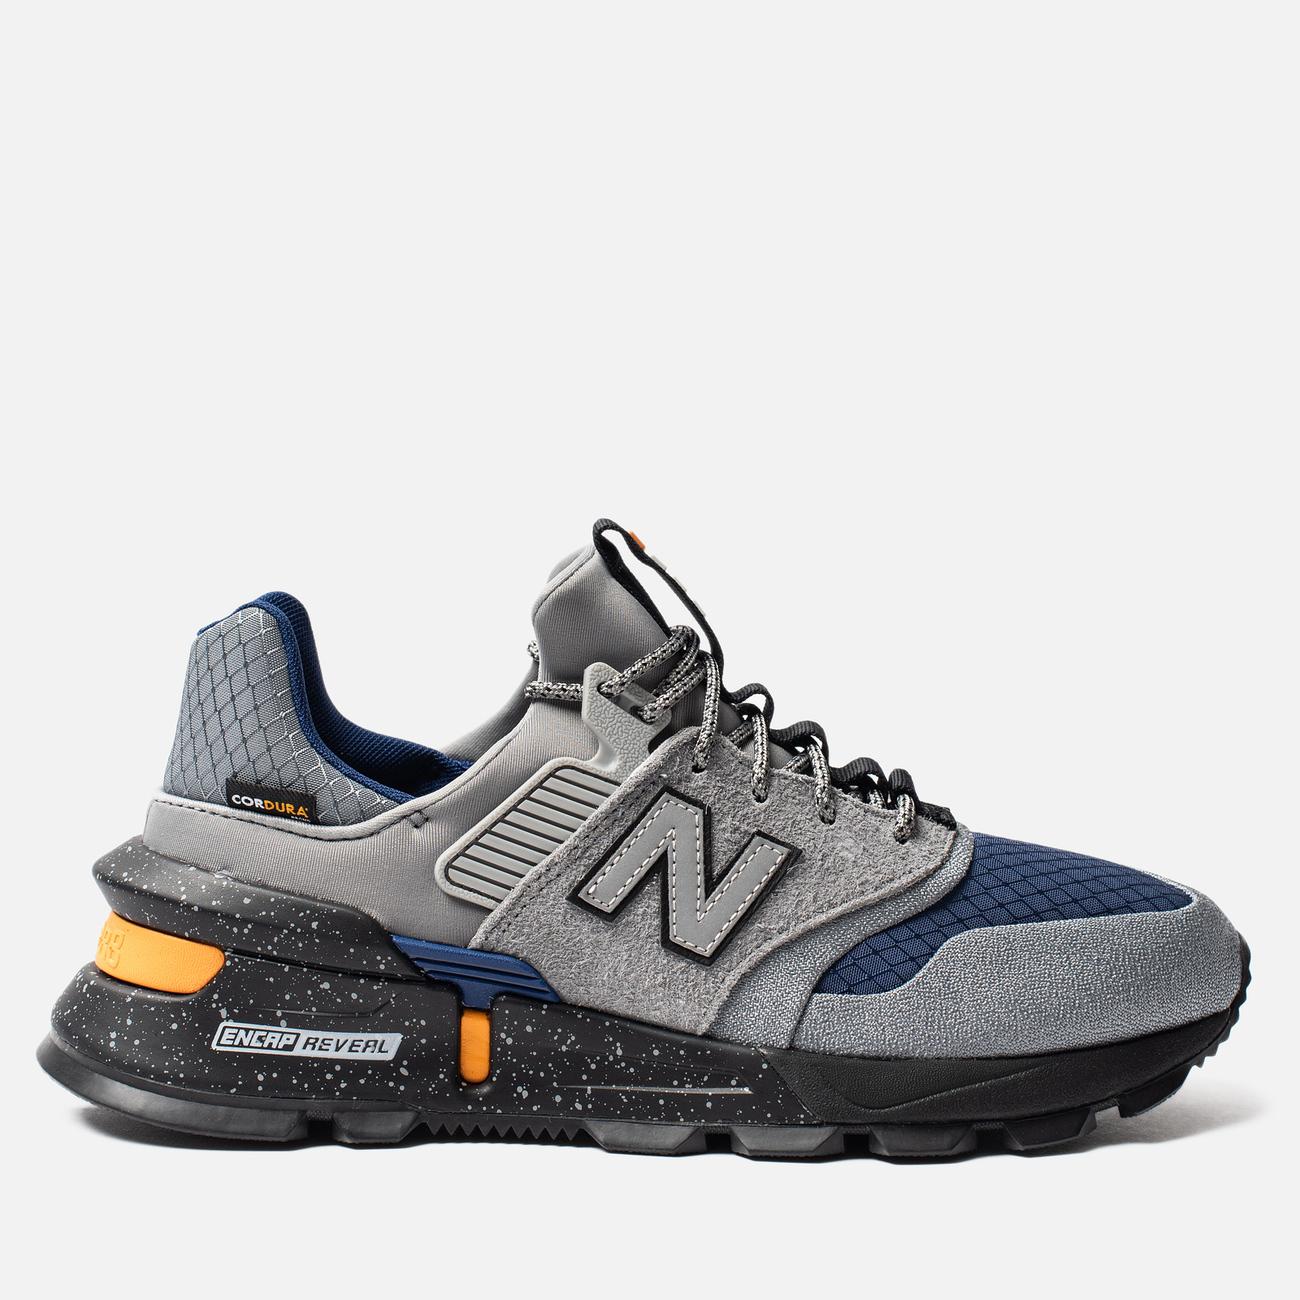 Мужские кроссовки New Balance MS997SC Outdoor Pack Grey/Black/White